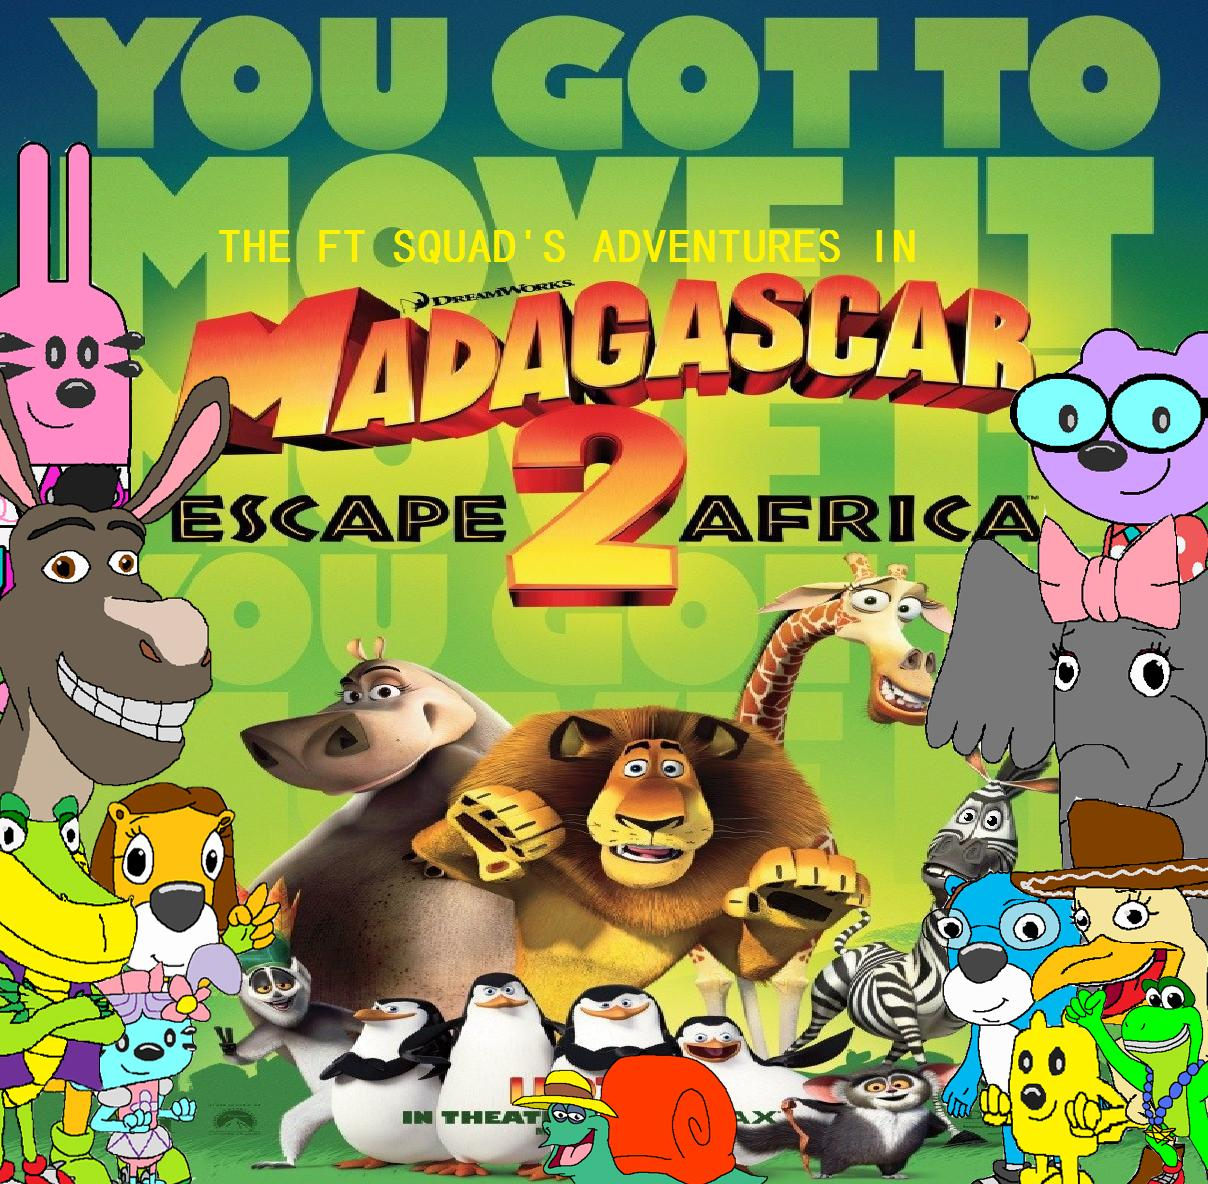 The FT Squad's Adventures in Madagascar: Escape 2 Africa